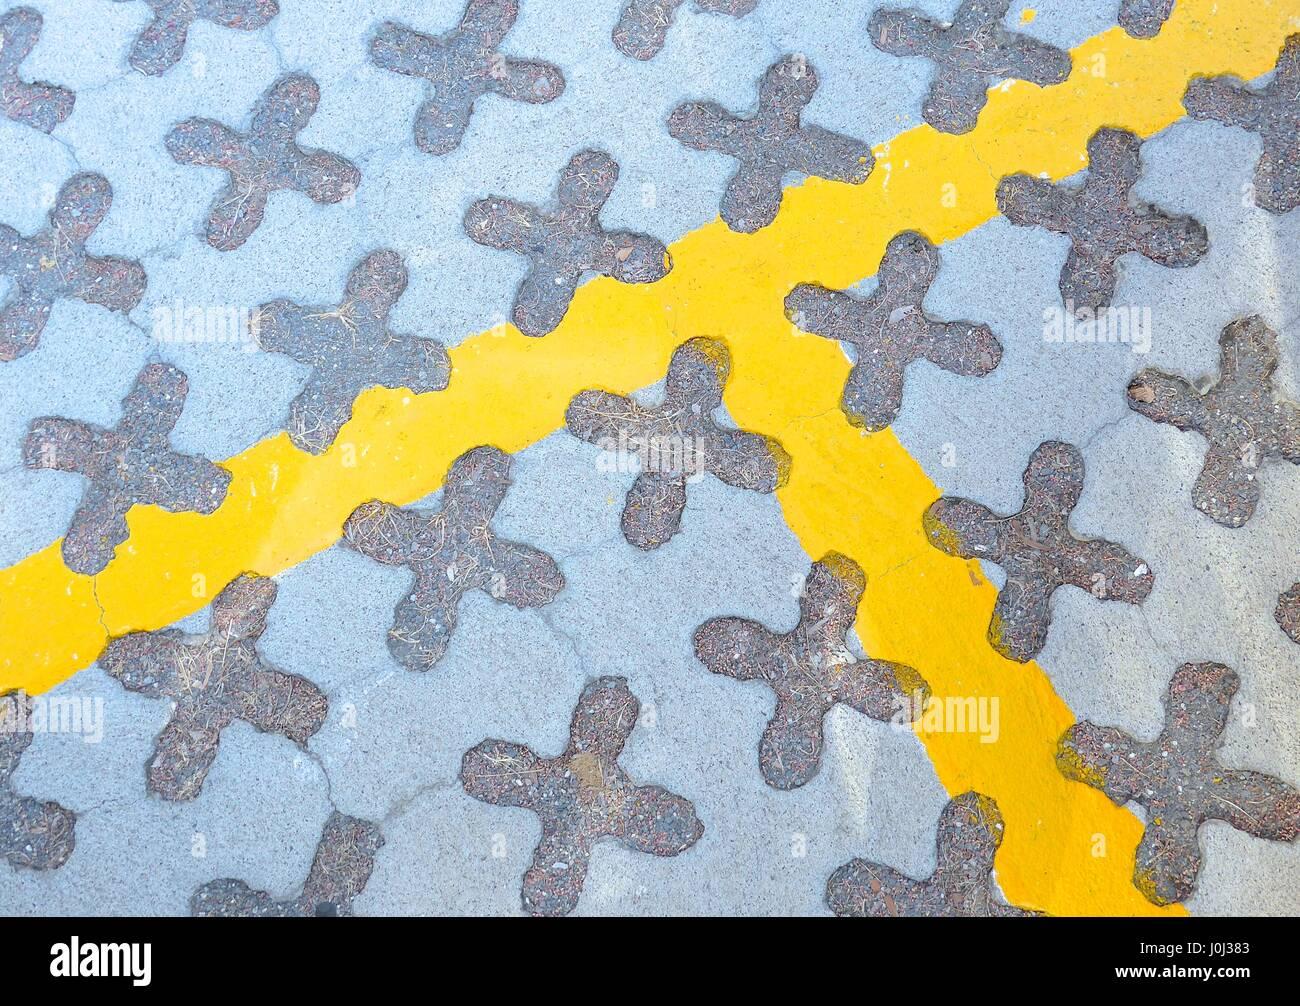 Sidewalk bricks closeup at city - Stock Image